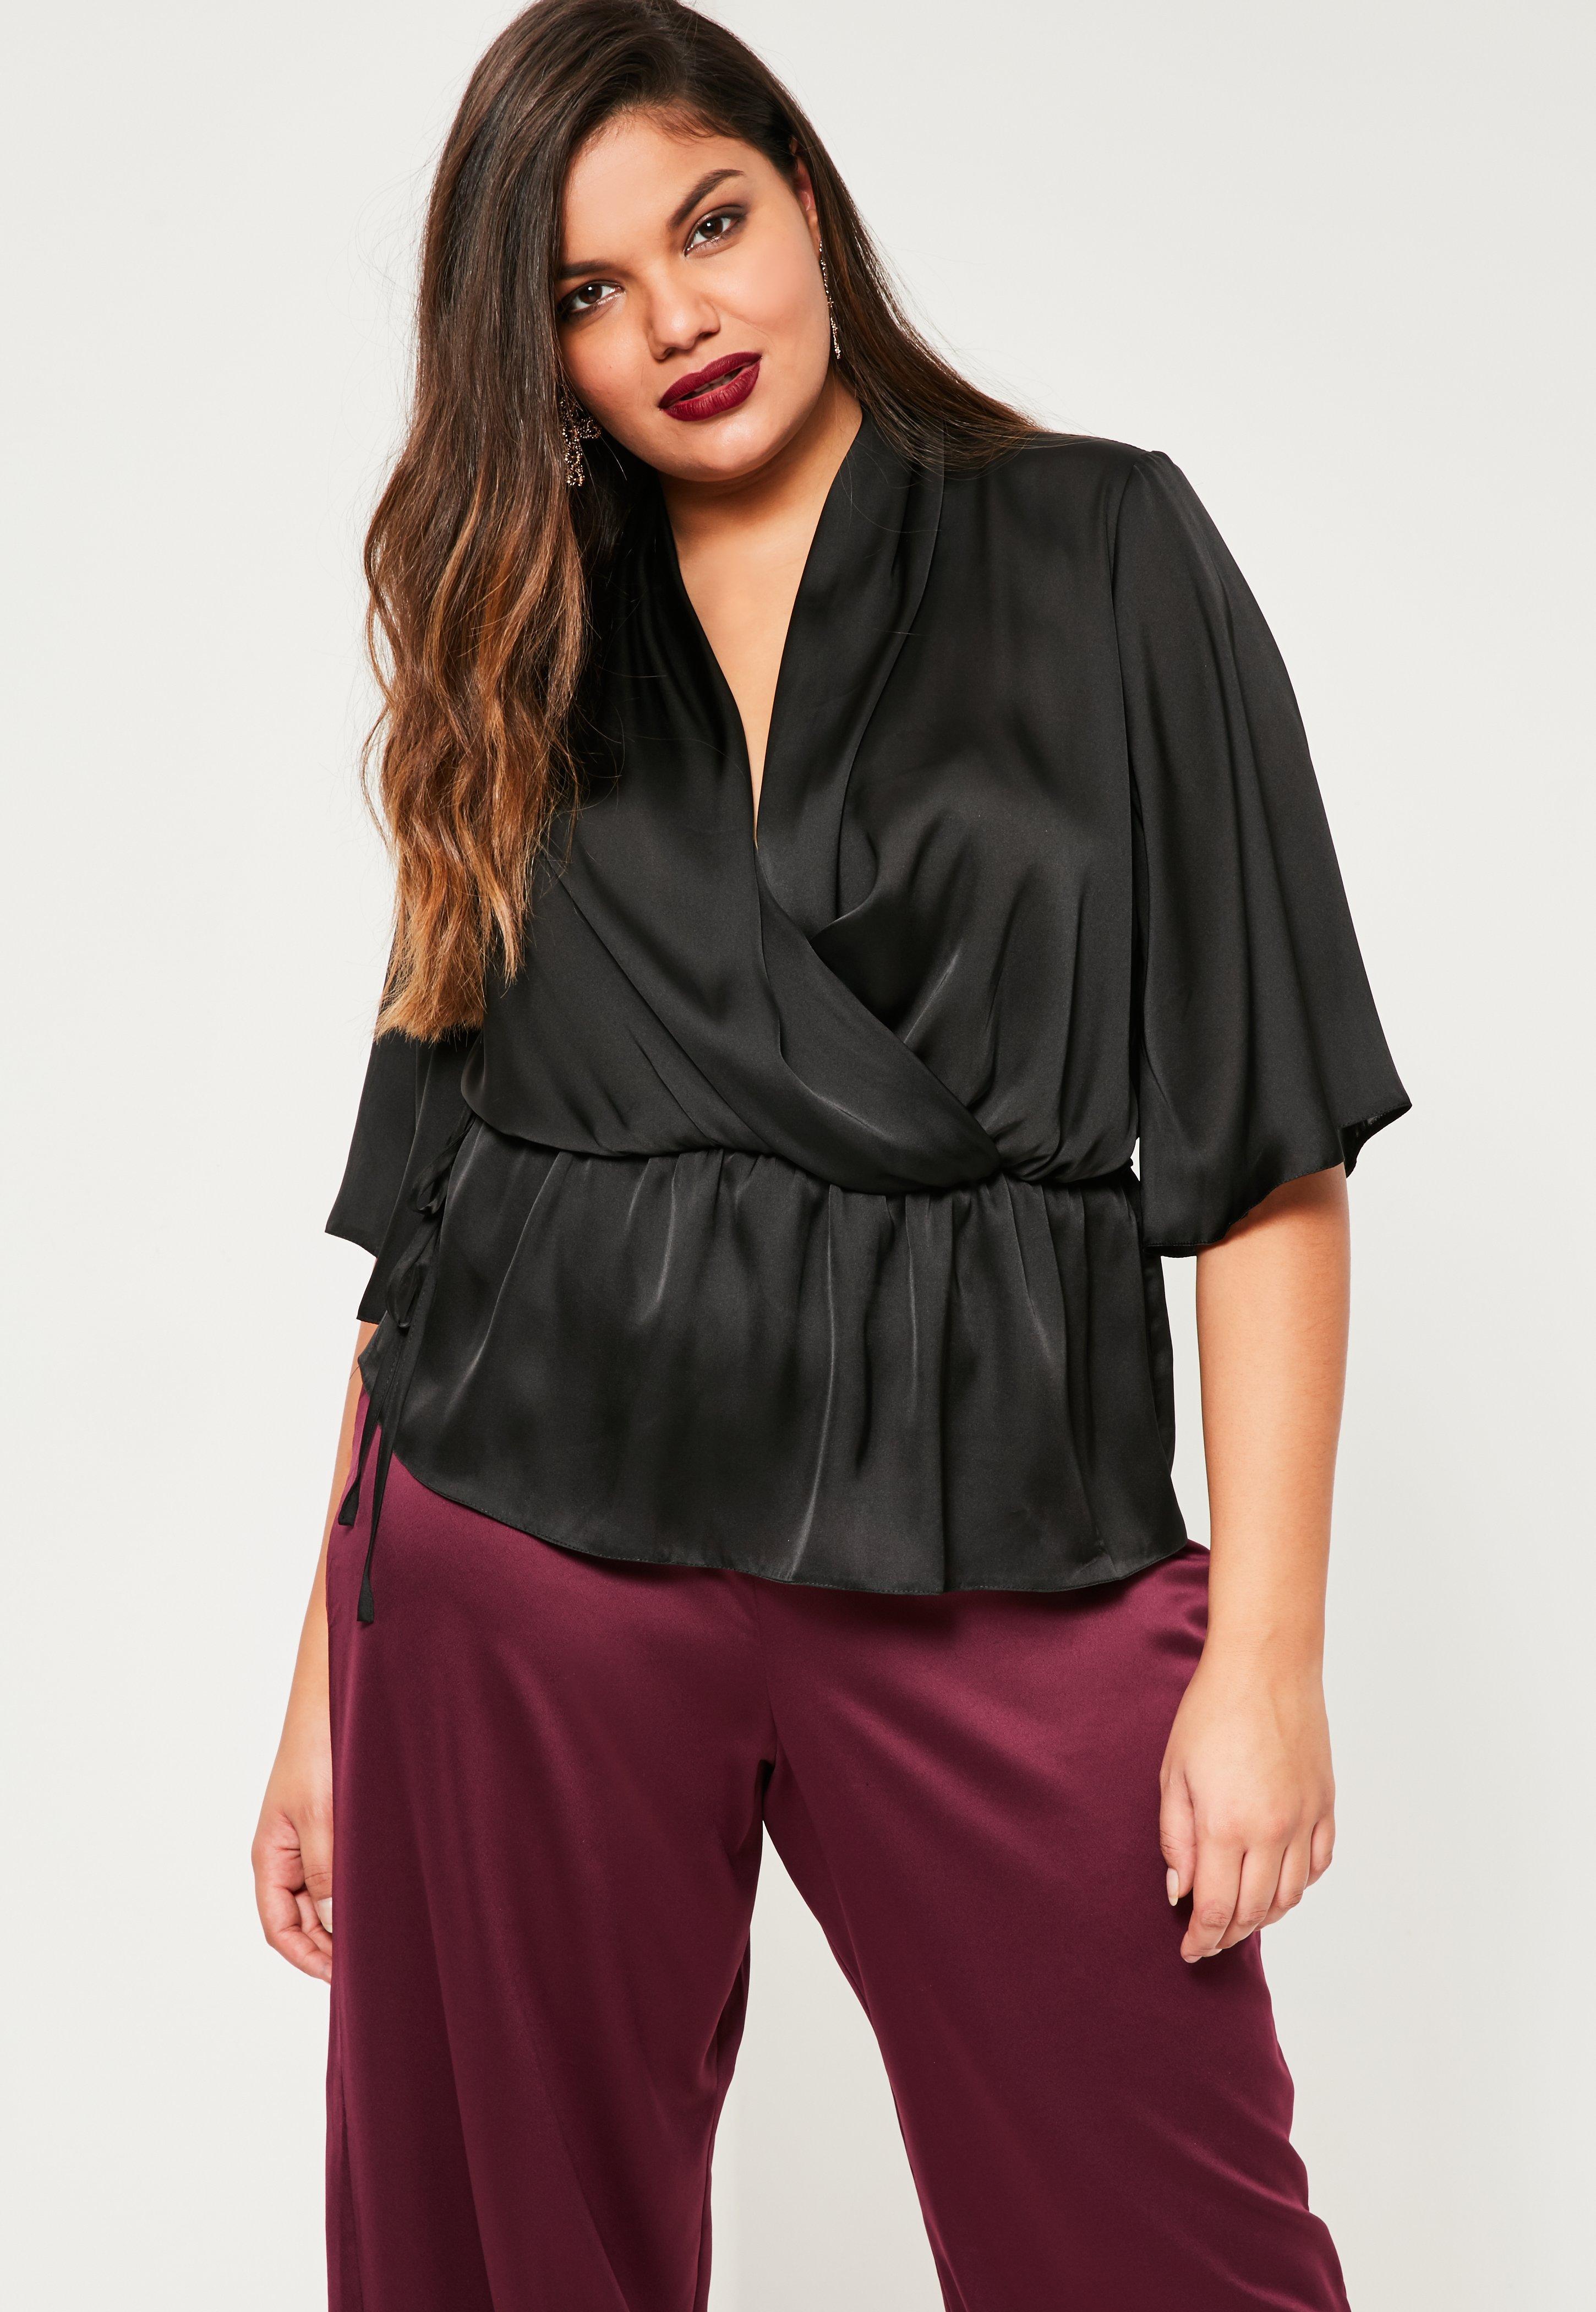 053595b9d913b Plus Size Black Satin Wrap Short Sleeve Blouse